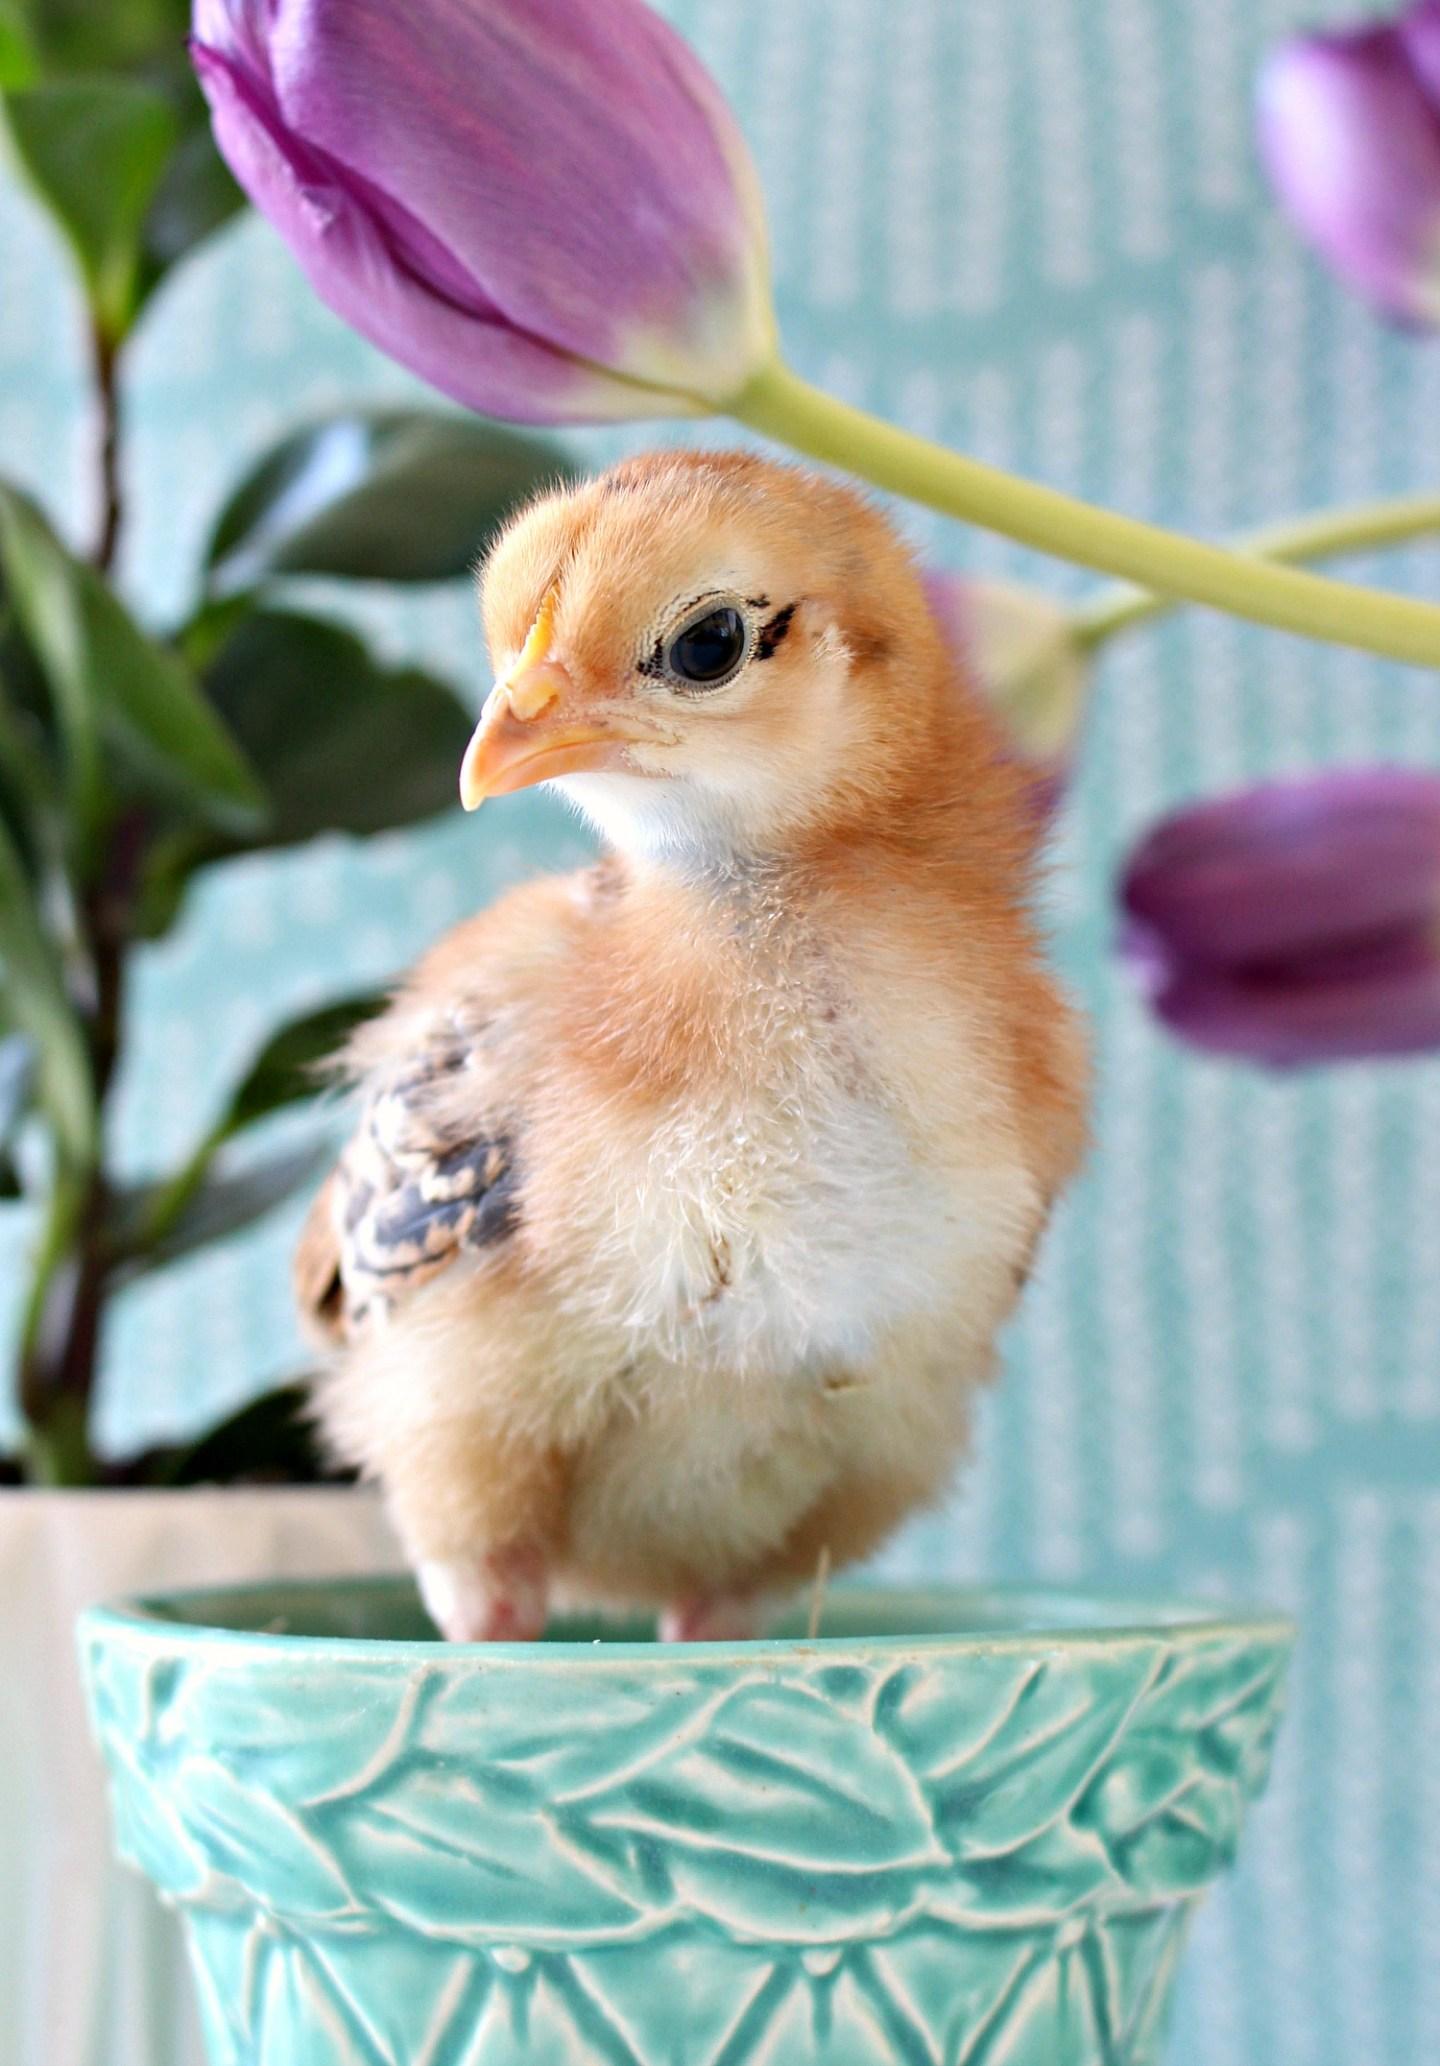 Photos of Baby Chicks